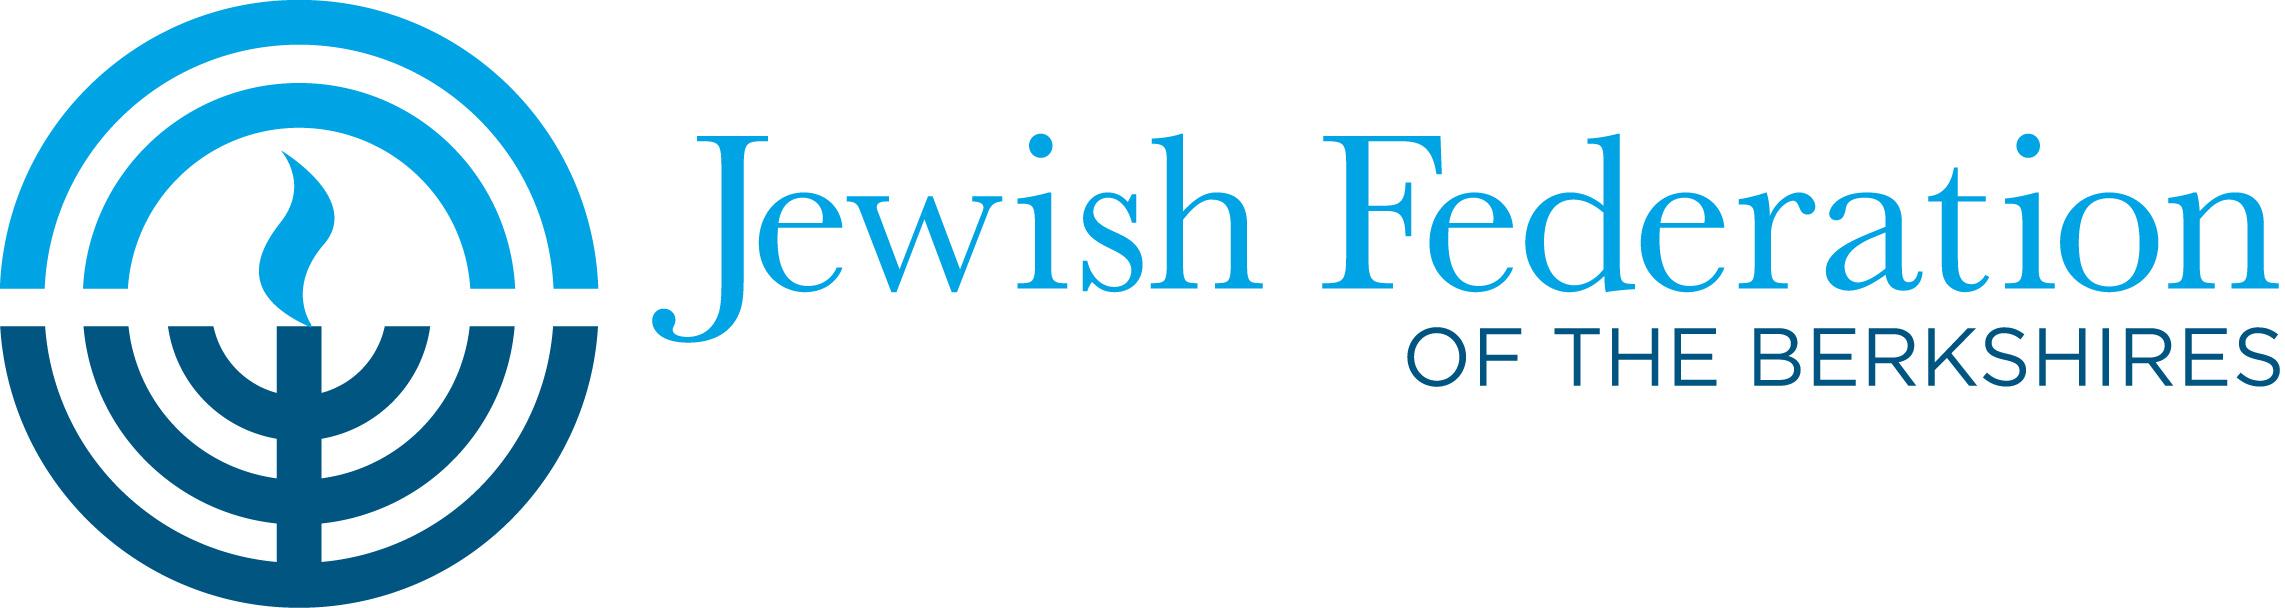 JF_Logo_2C_Berkshires